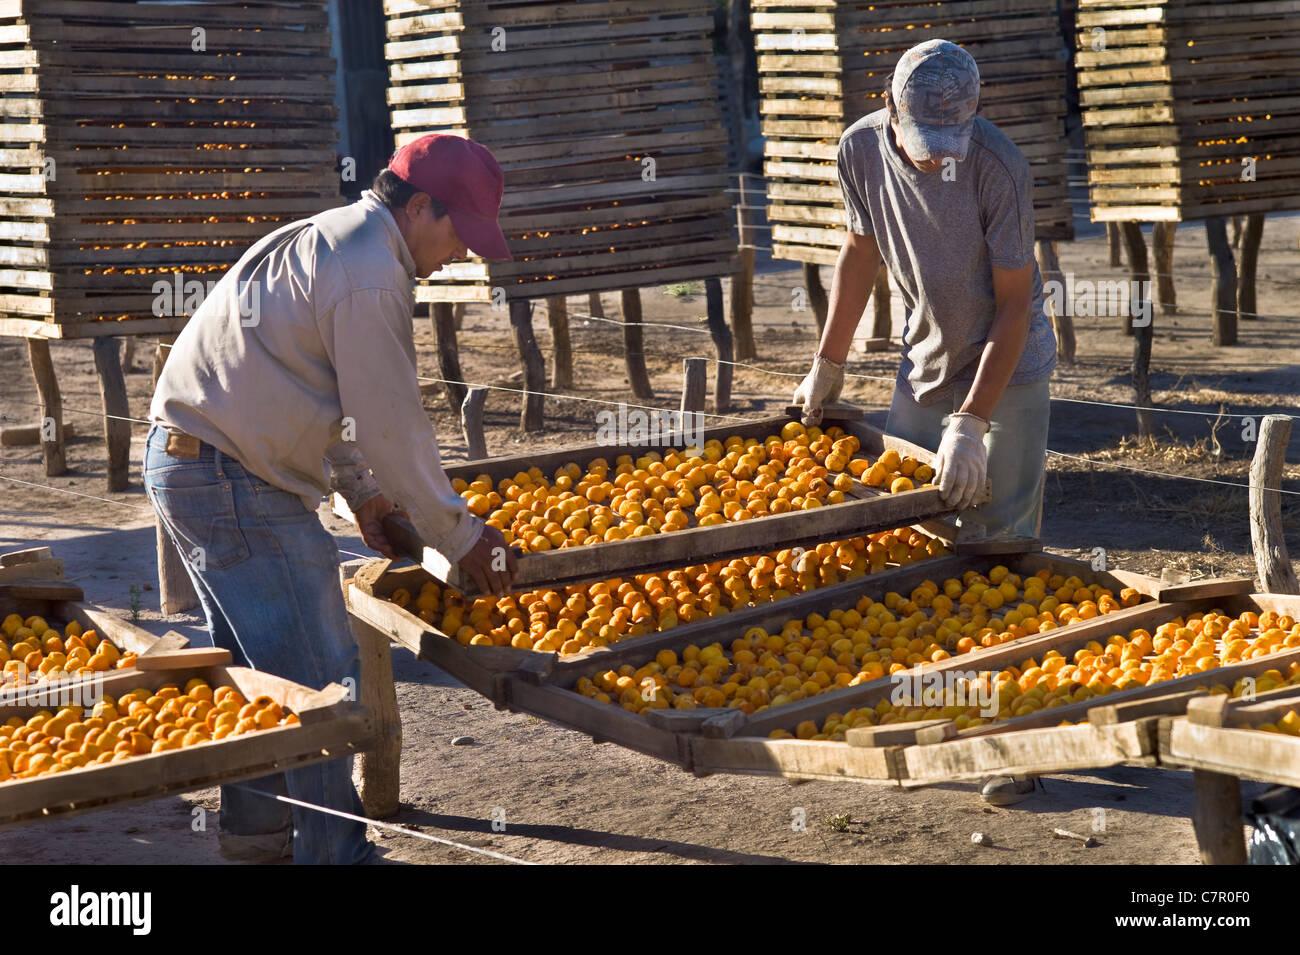 Peaches spread put on rack drying, San Rafael, Argentina - Stock Image